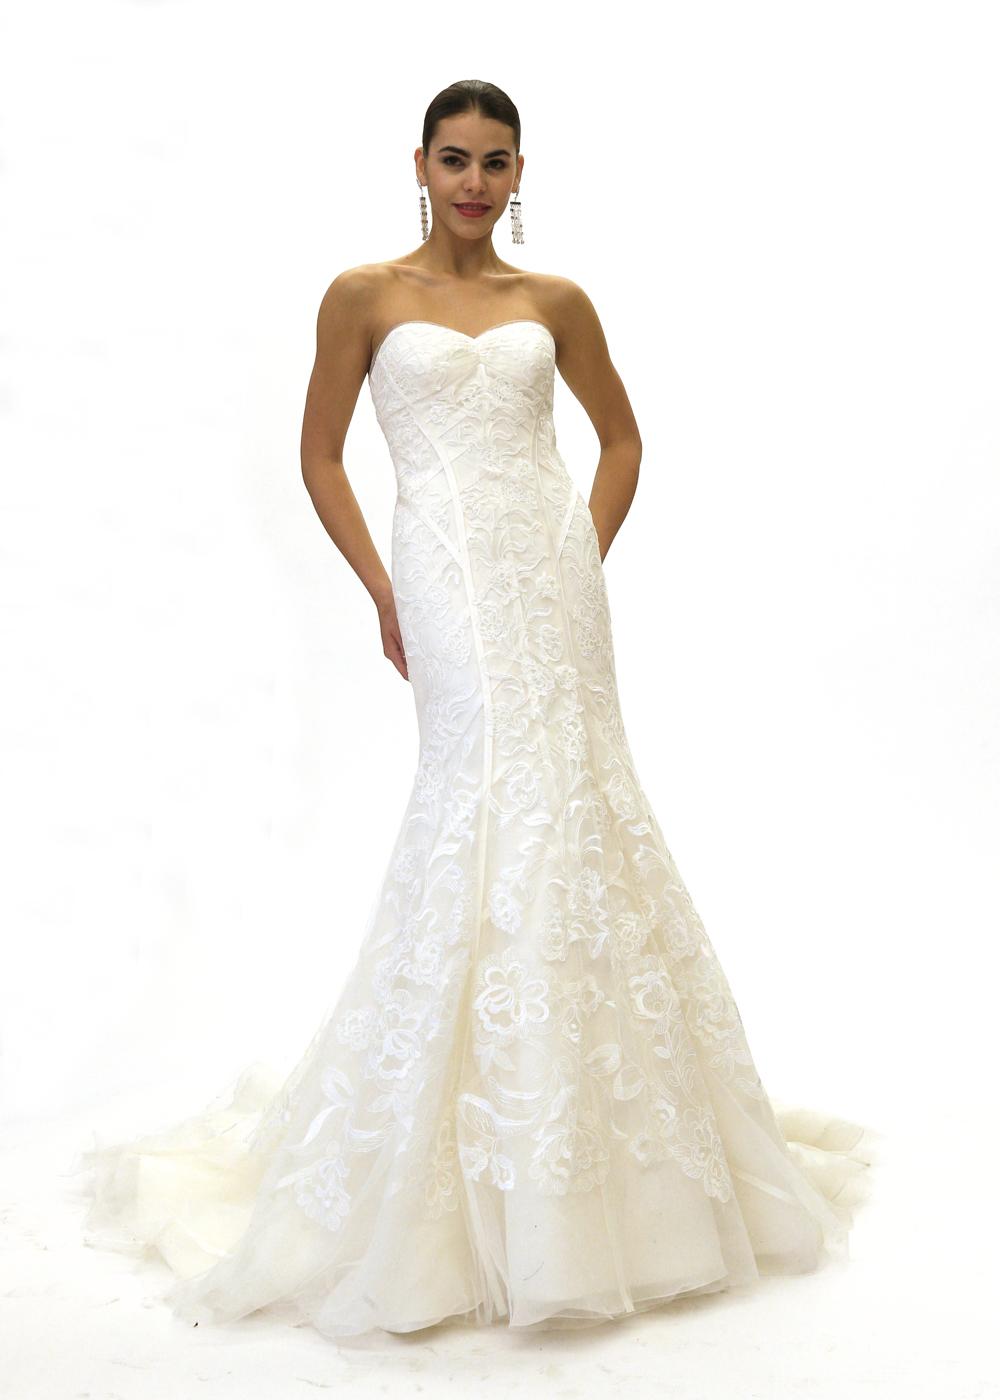 Zac Posen Classic Strapless Mermaid Wedding Gown